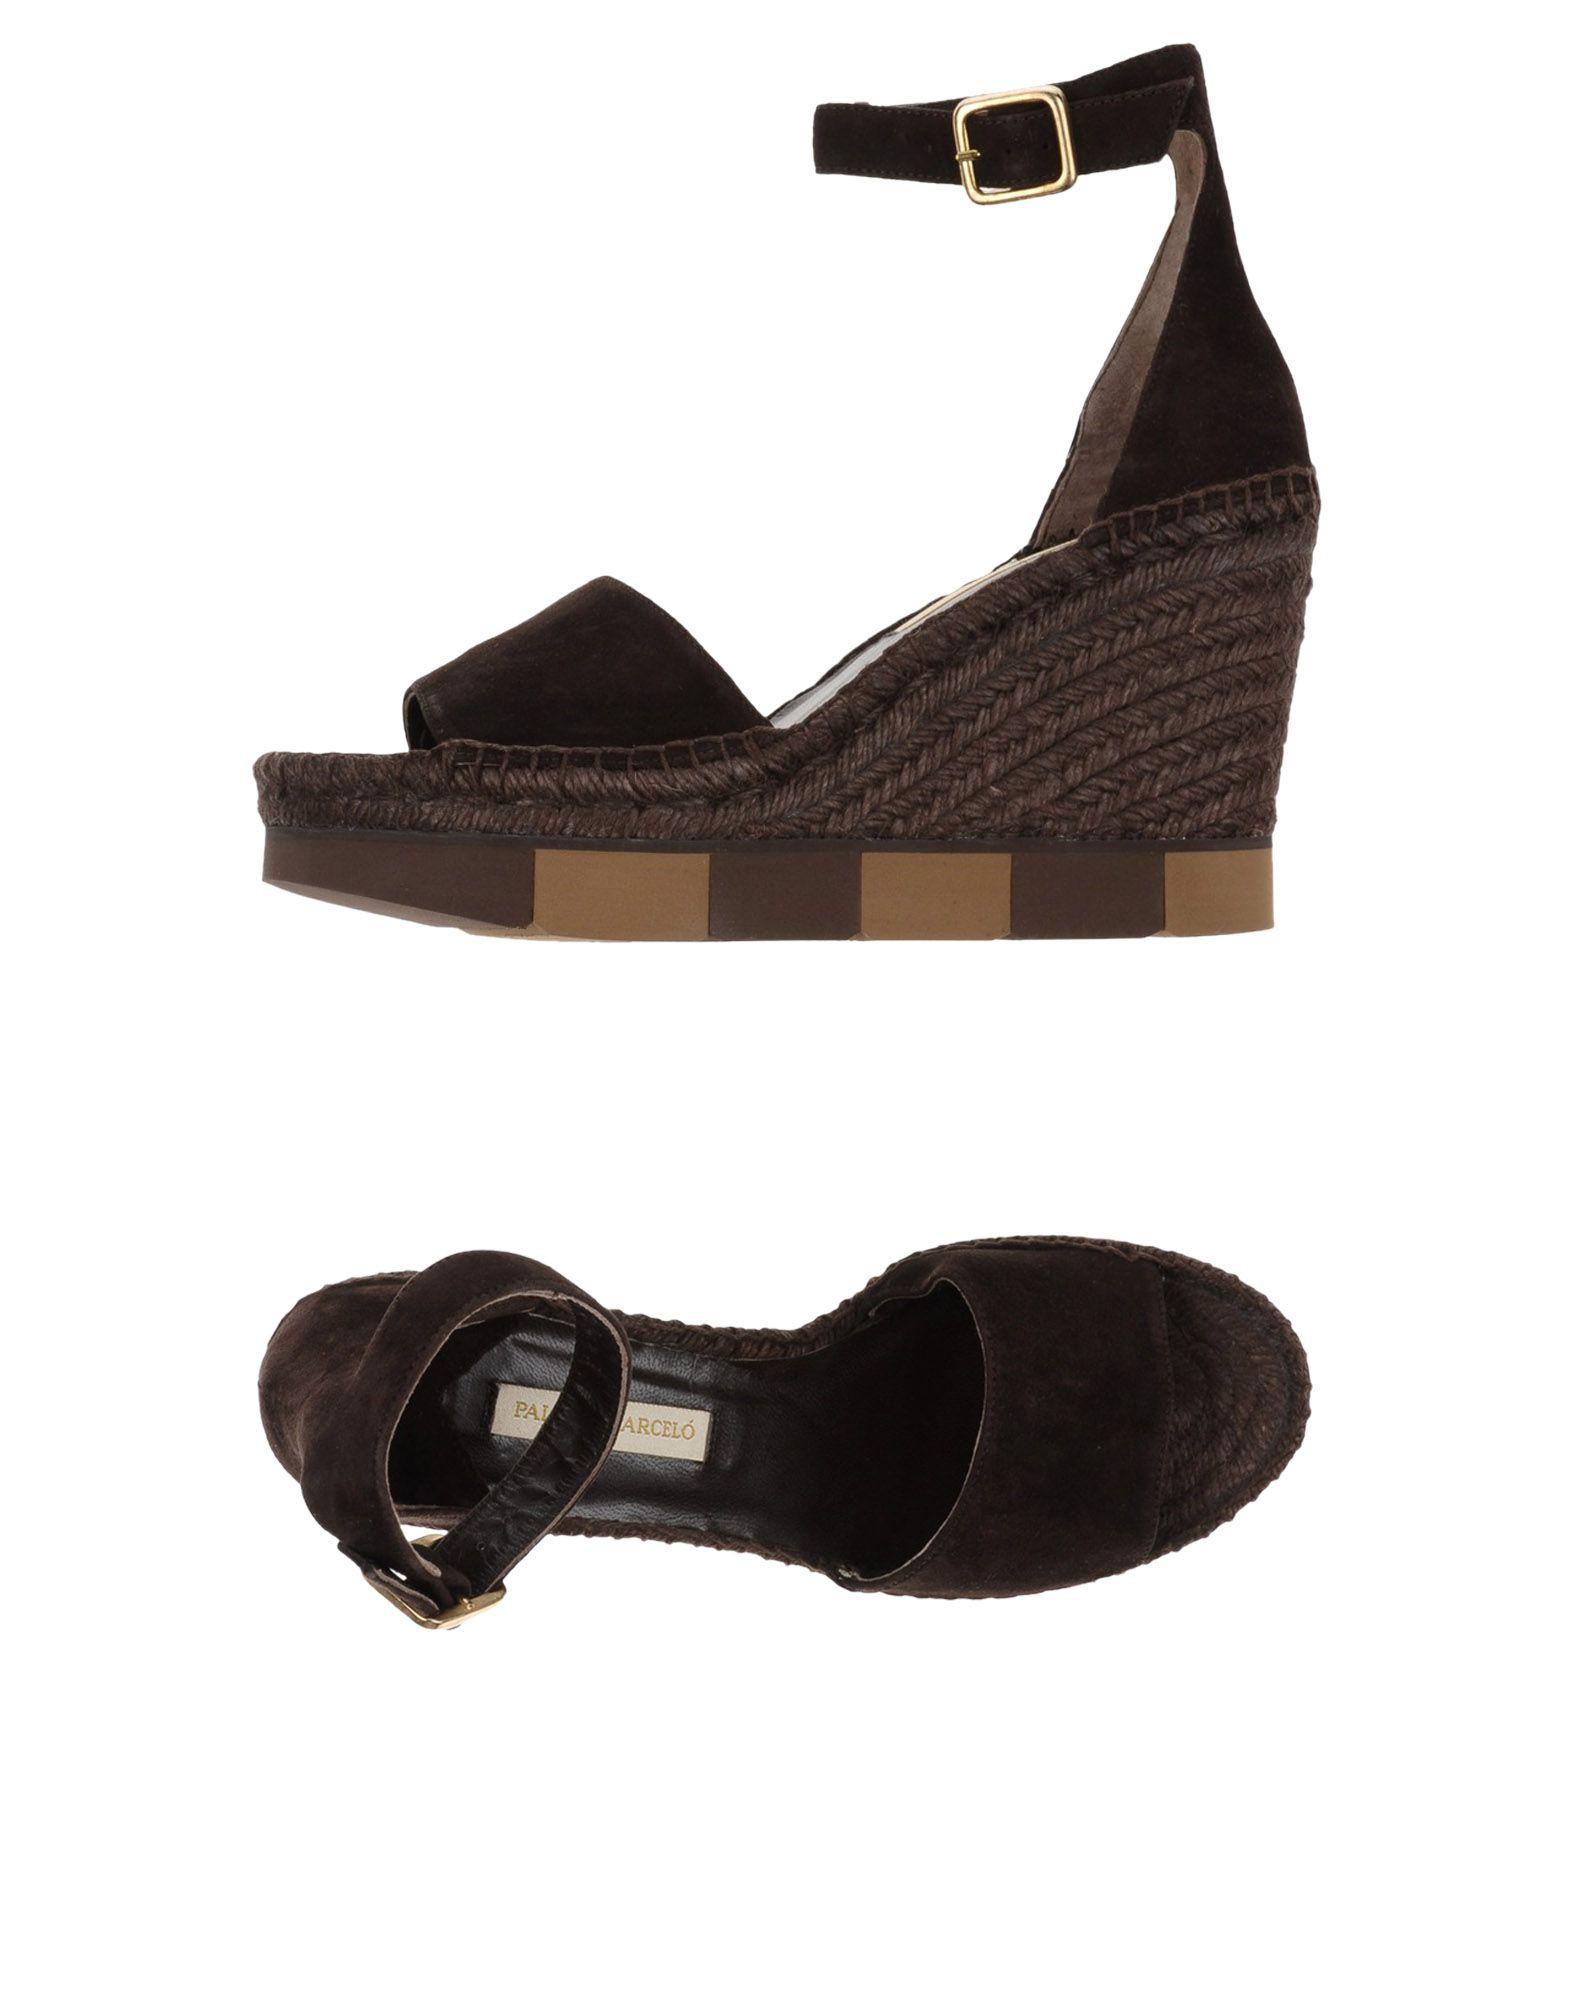 Paloma Barceló Sandalen Damen  11363456EP Gute Qualität beliebte Schuhe